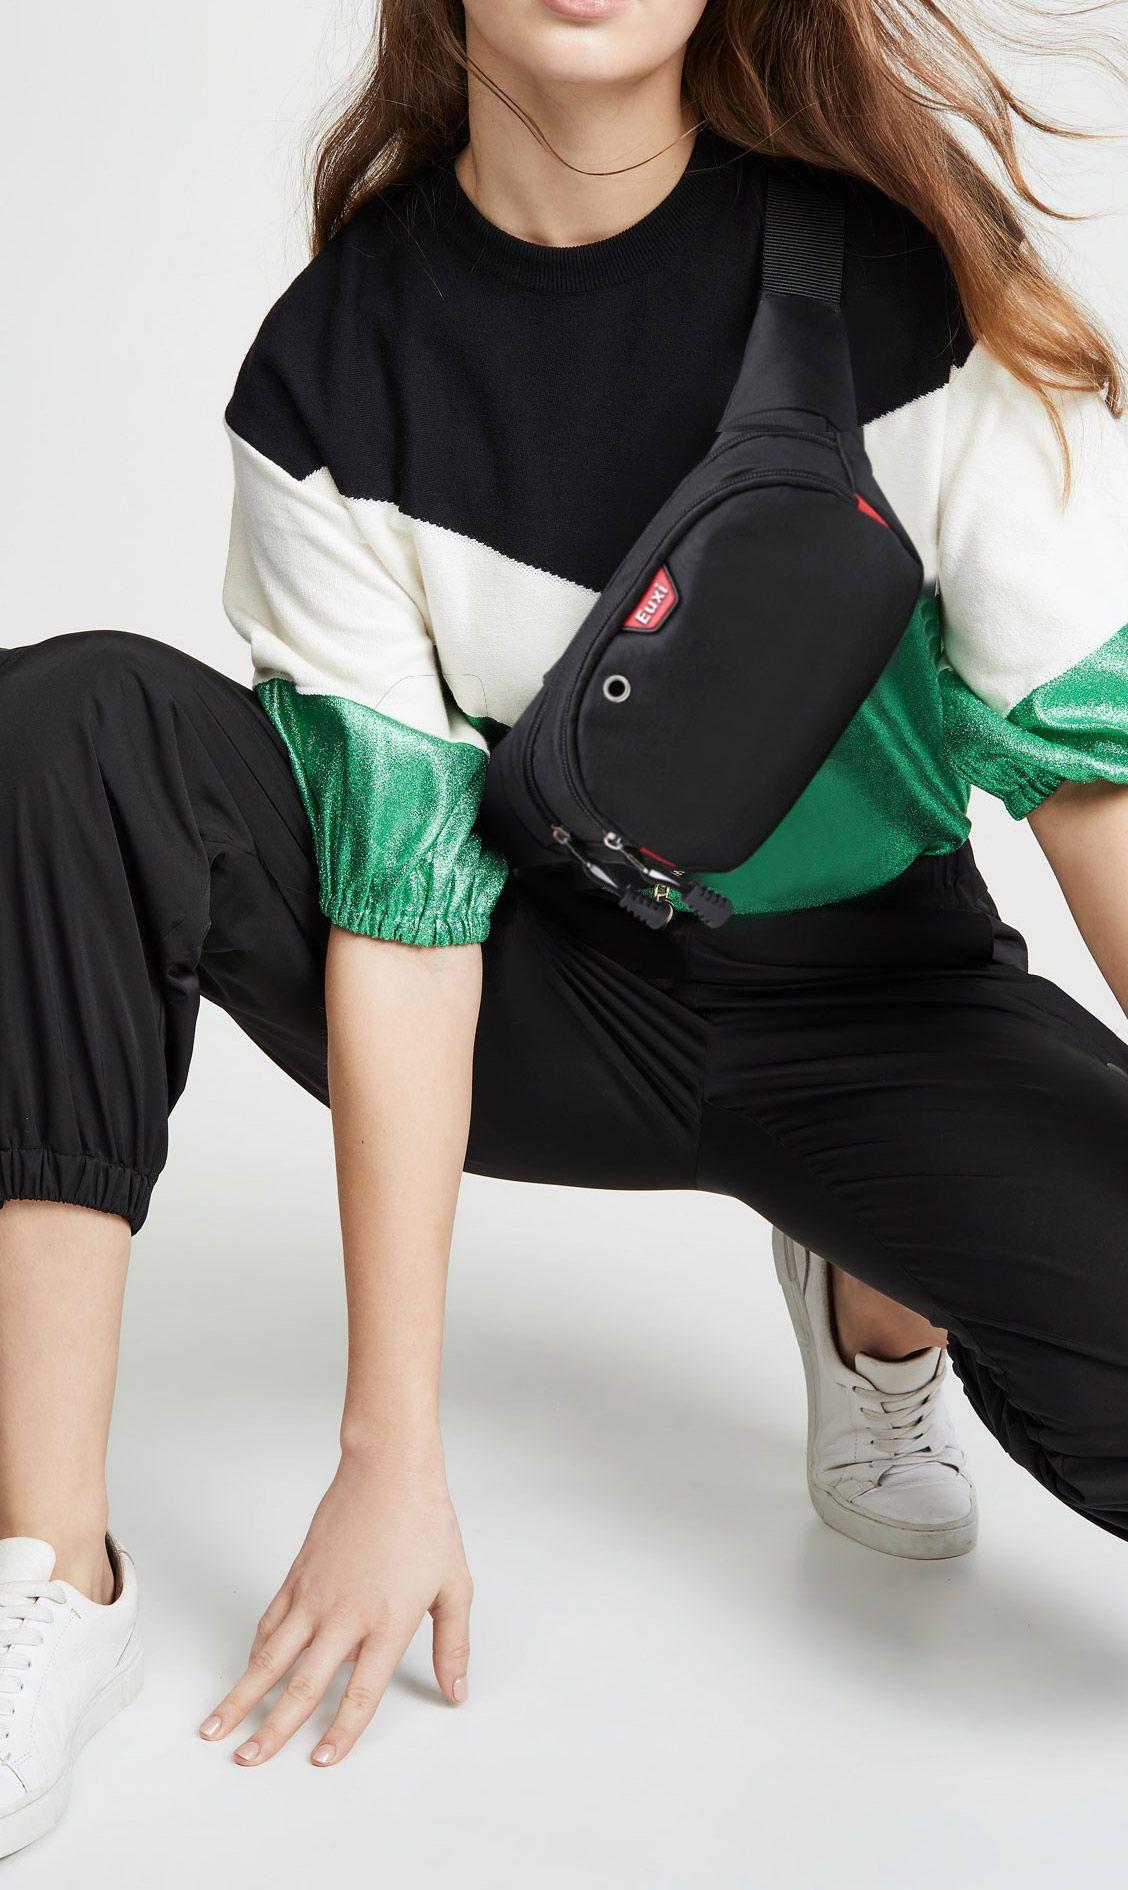 Pin on KMartins Running Fanny Pack Waist bag pack Bum Bag